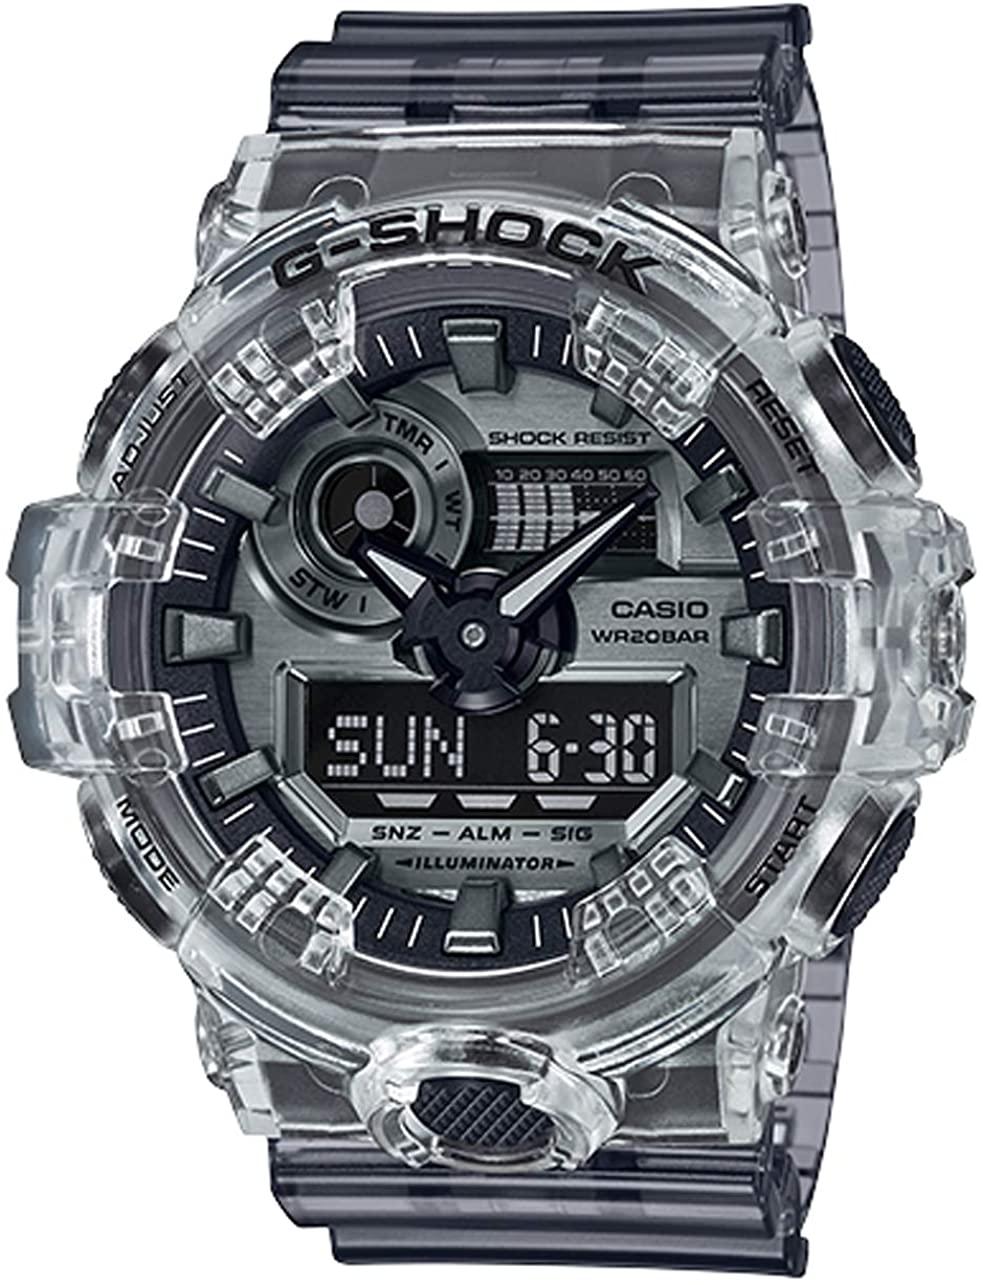 Casio G-Shock Analog-Digital Skeleton Semi-Transparent Resin Watch(GA700SK-1A)